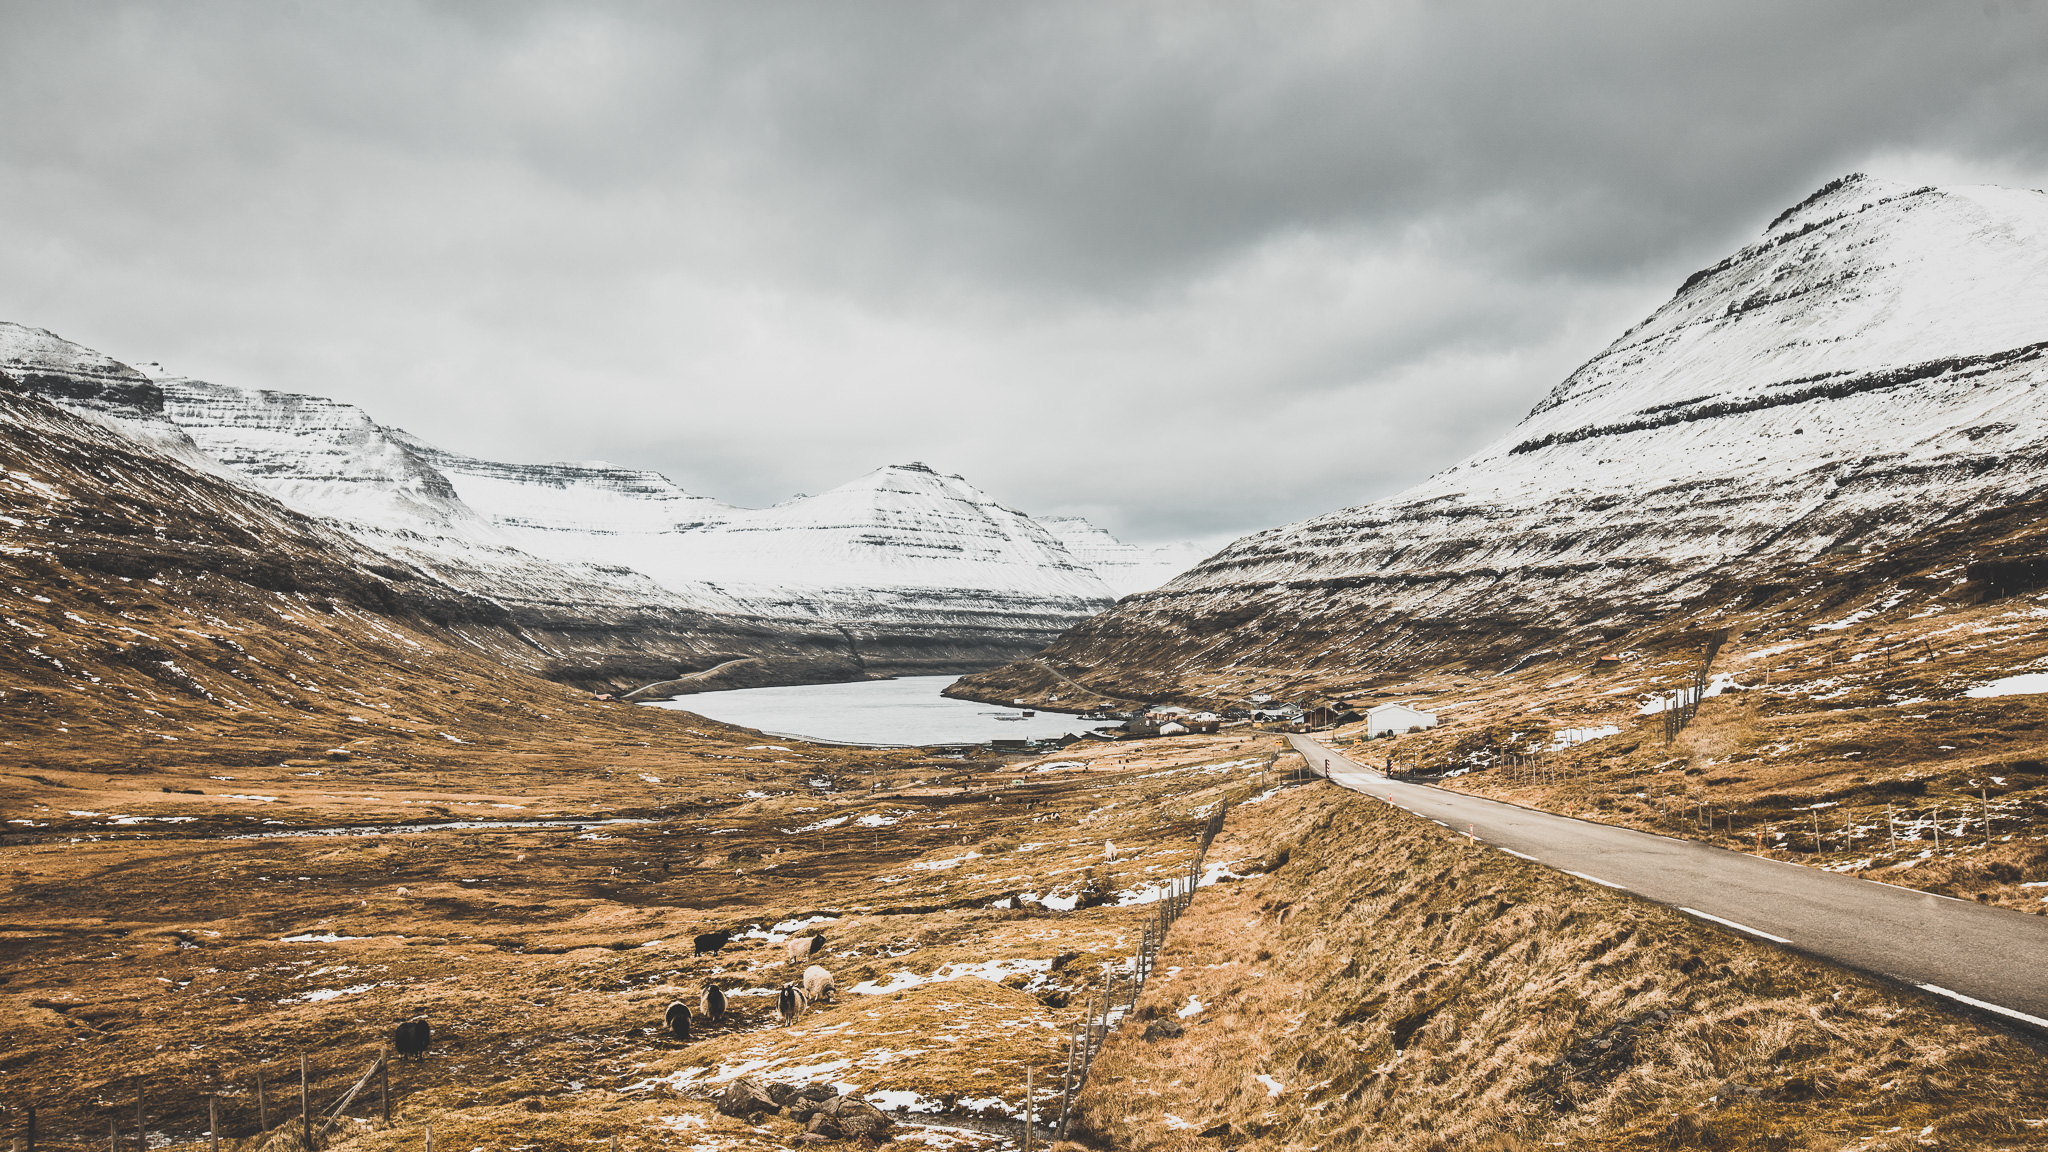 FaroeIslands-FunningurFjørdur-Instagram-HansChristianStrikert-1.jpg